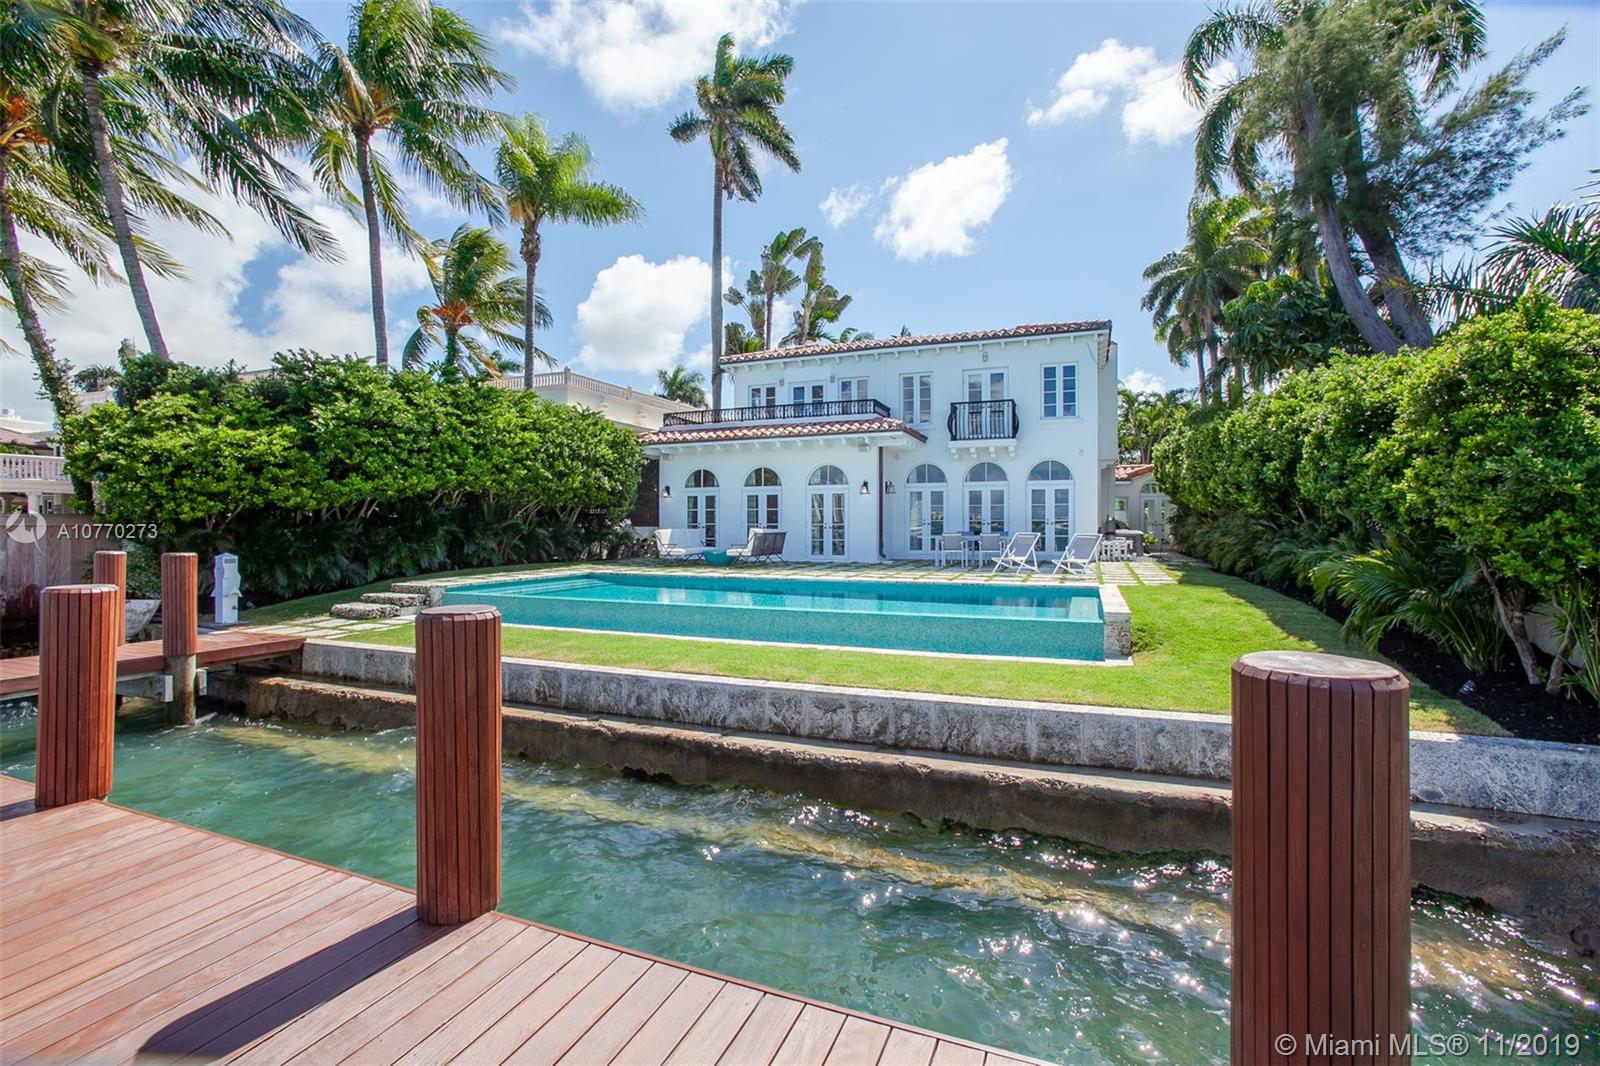 77 N Hibiscus Dr Luxury Real Estate